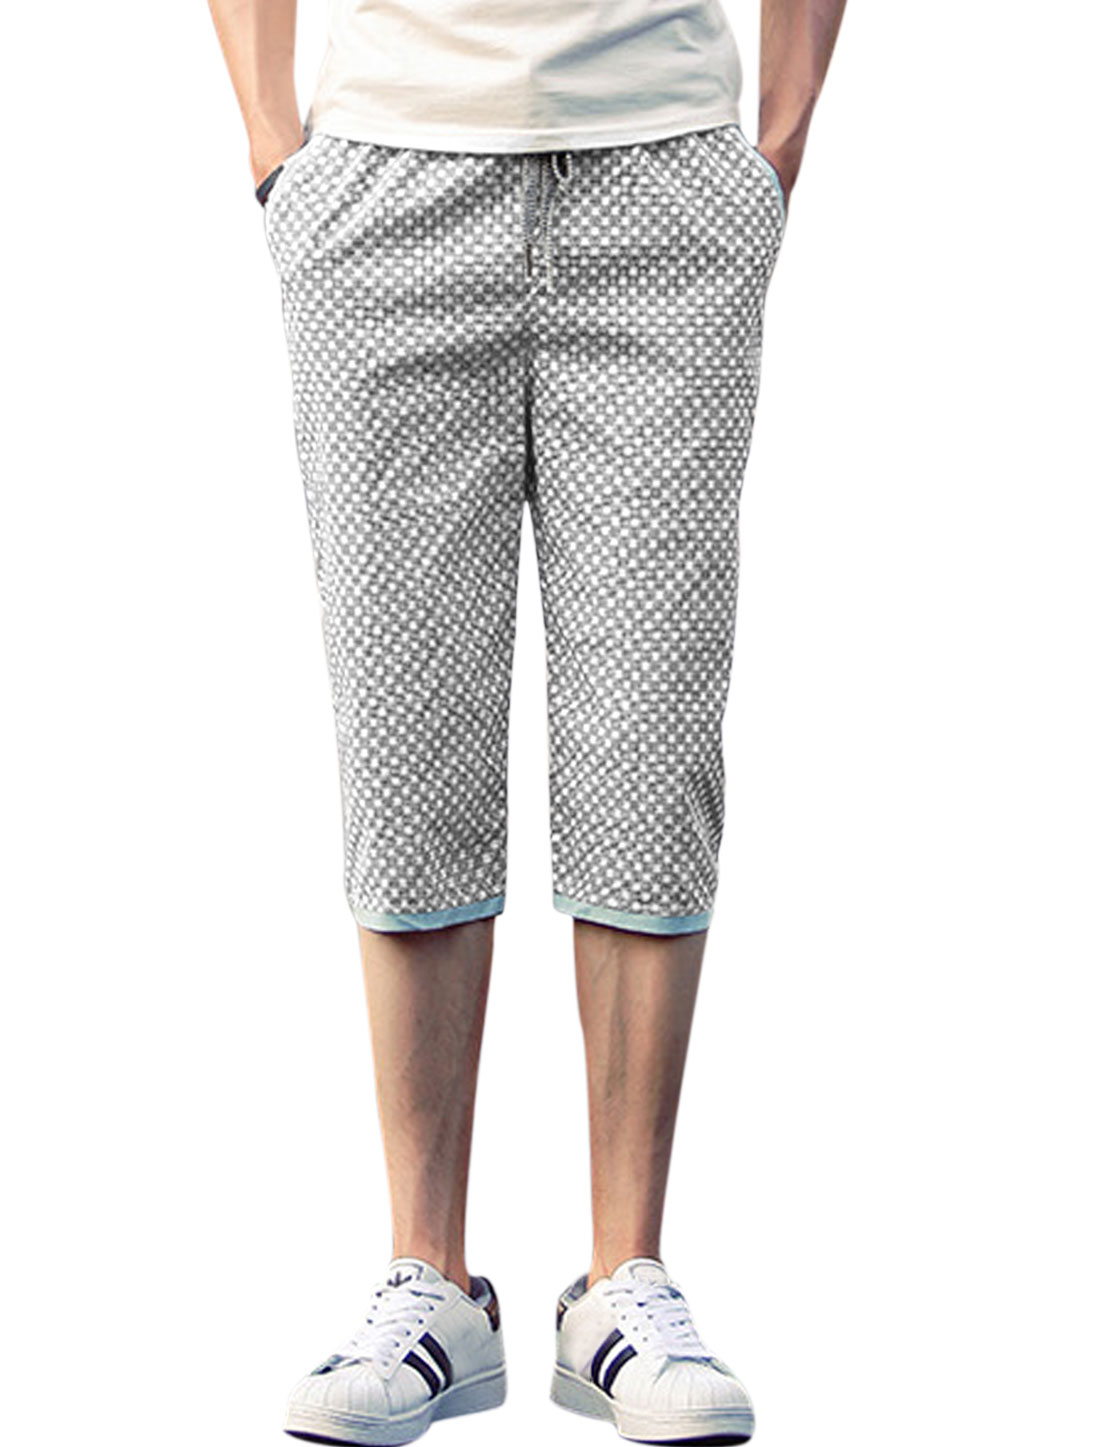 Men Geometrical Prints Mid Rise Leisure Capris Pants Black White W30